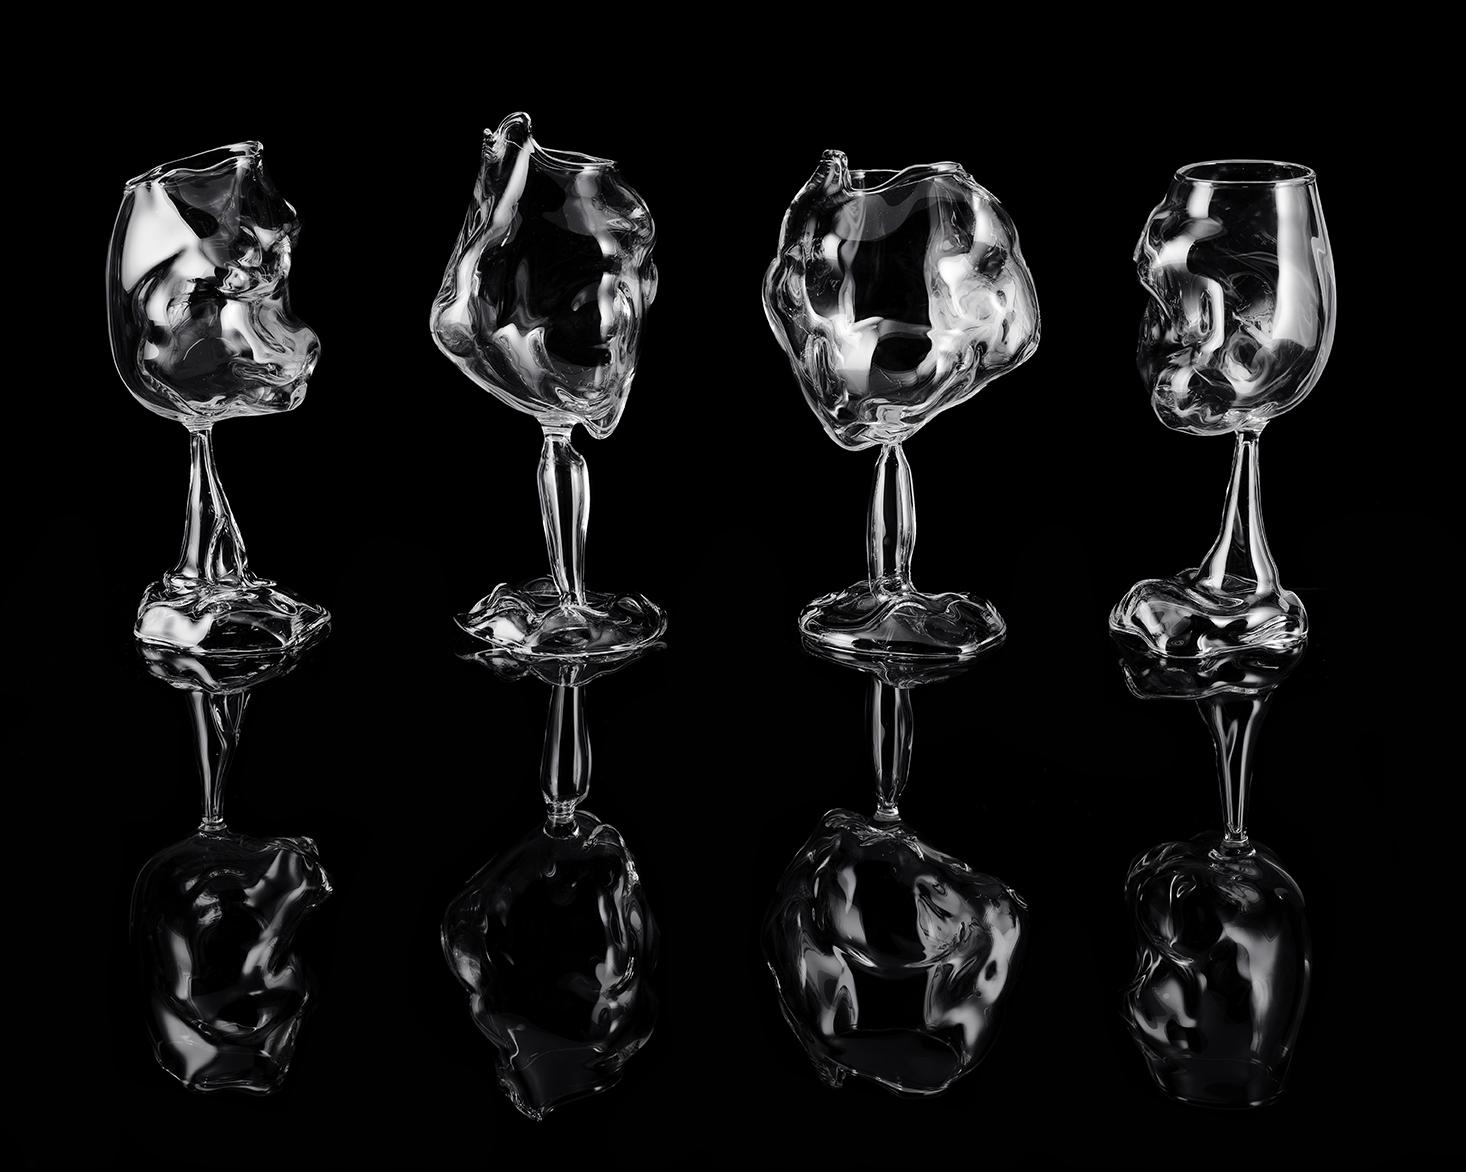 GM_CROSSFIRE_wineglass2_series_ShannonToft.jpg